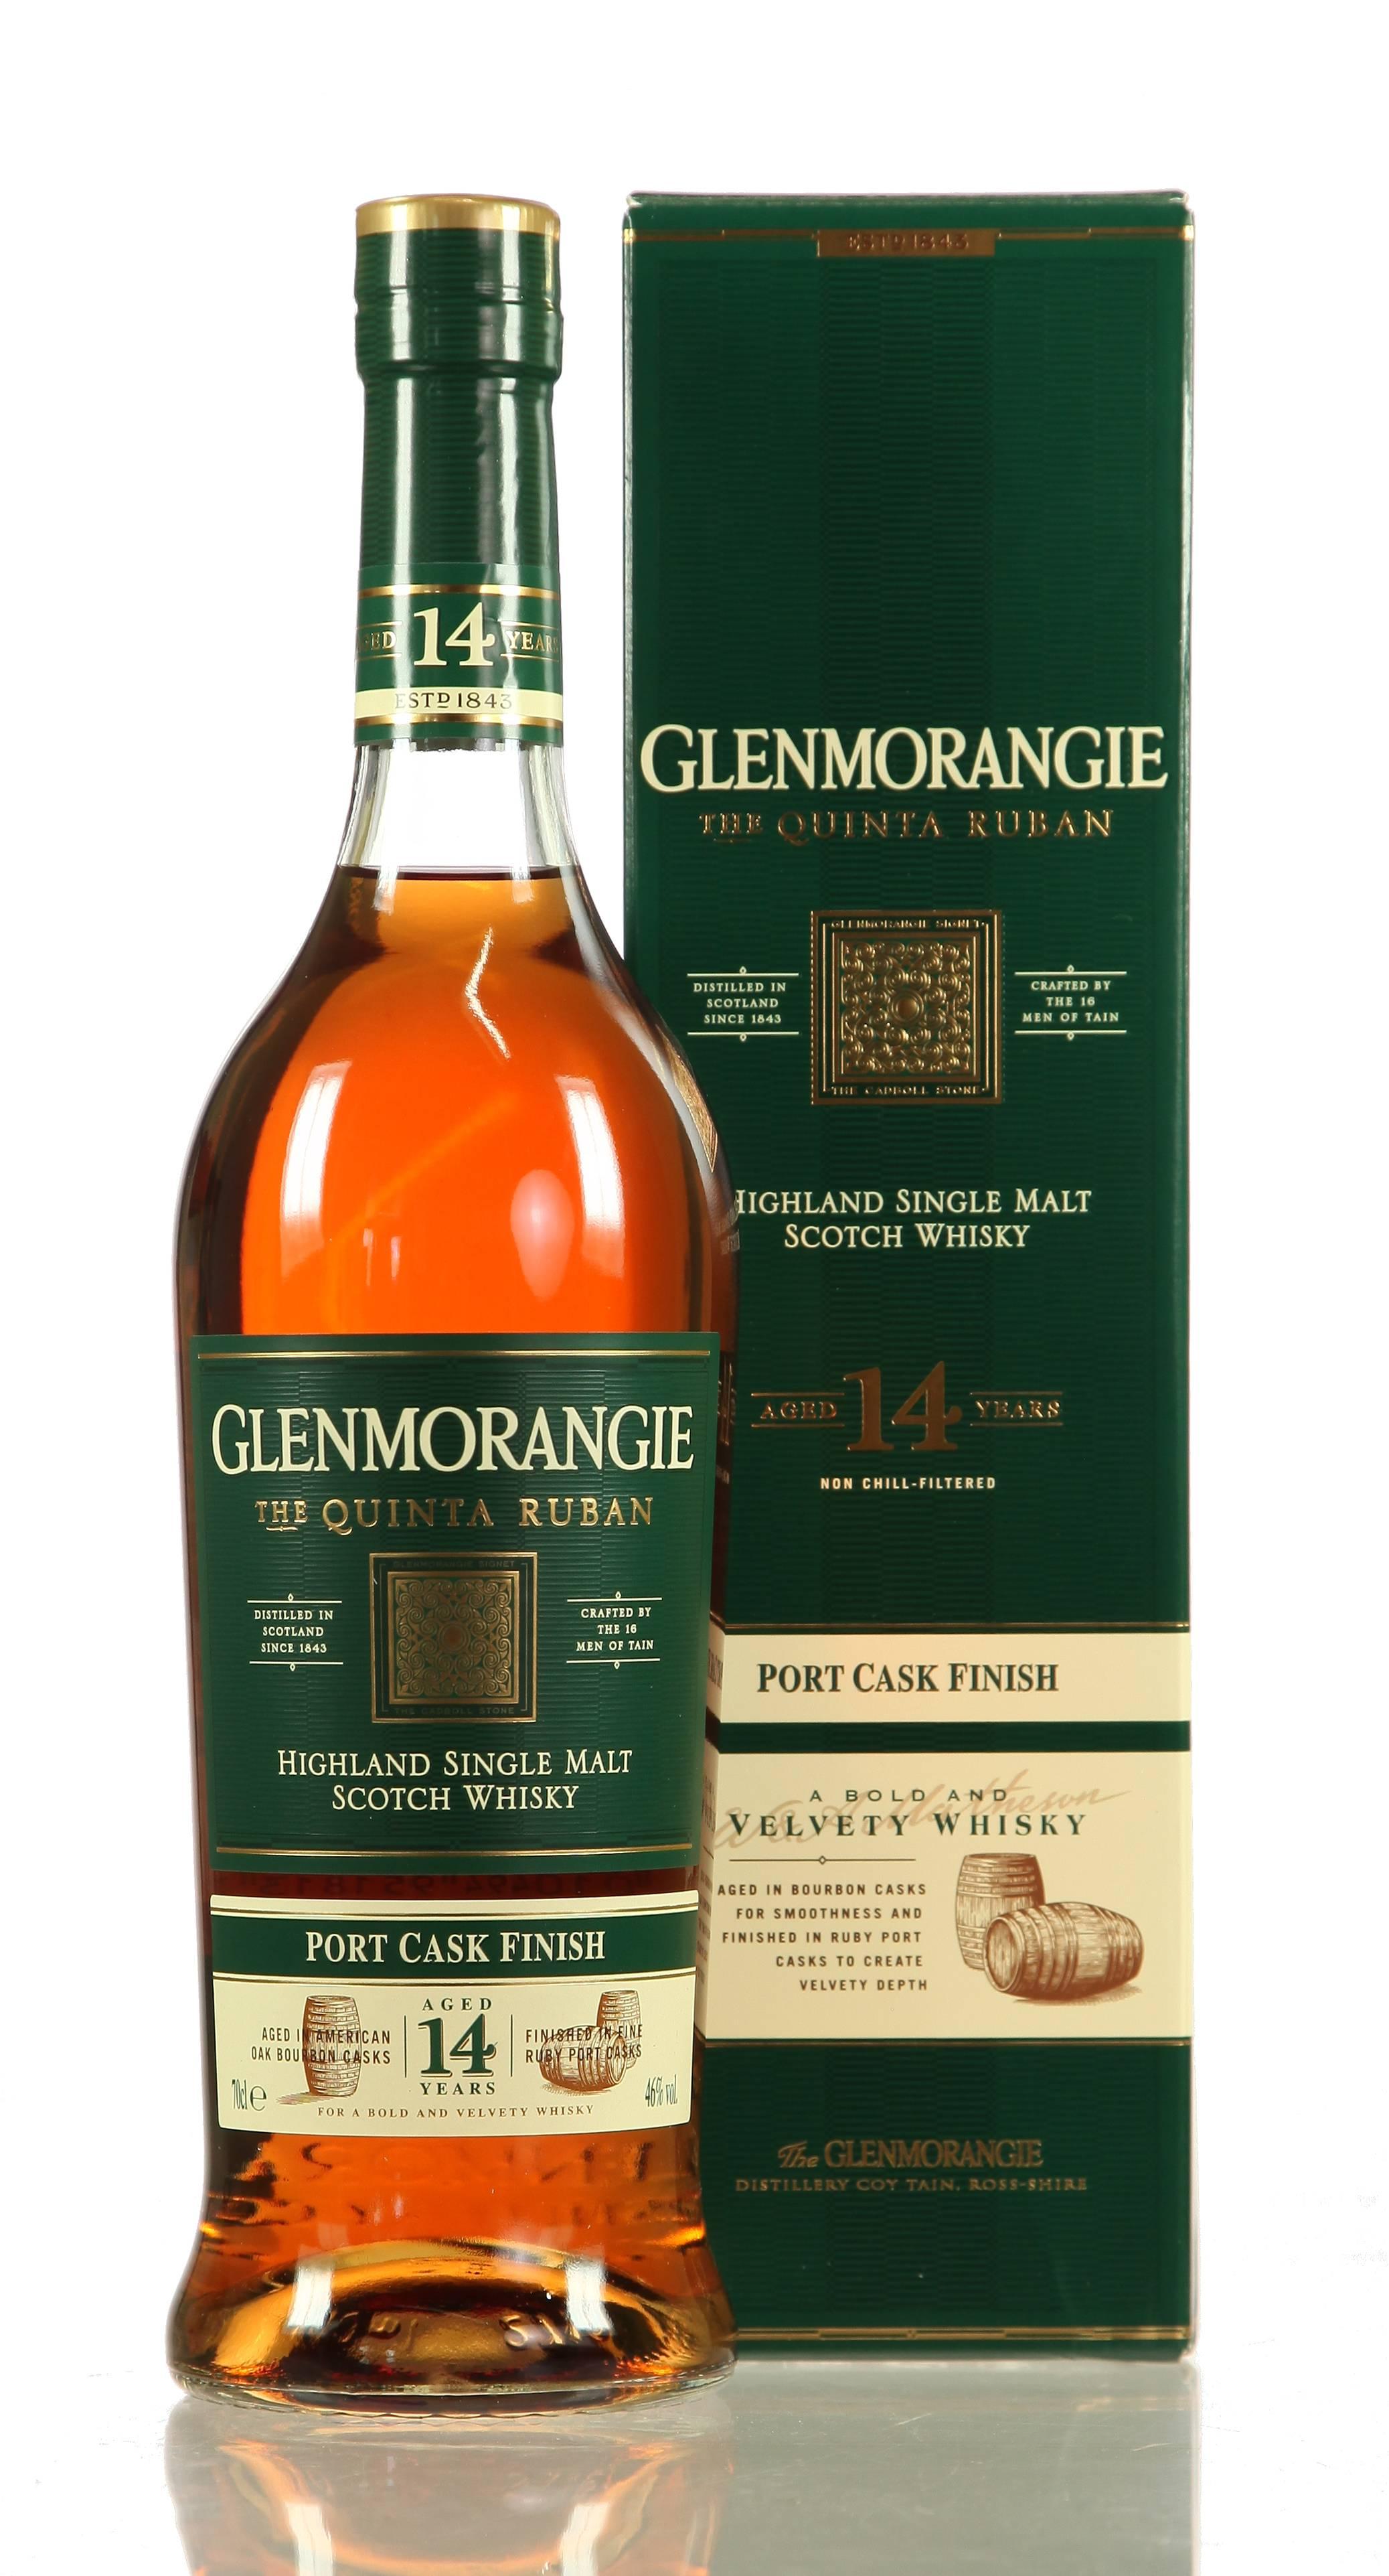 Glenmorangie 14 Quinta Ruban, Ailsa Bay 1.2, Compass Box Myths & Legends II Whisky